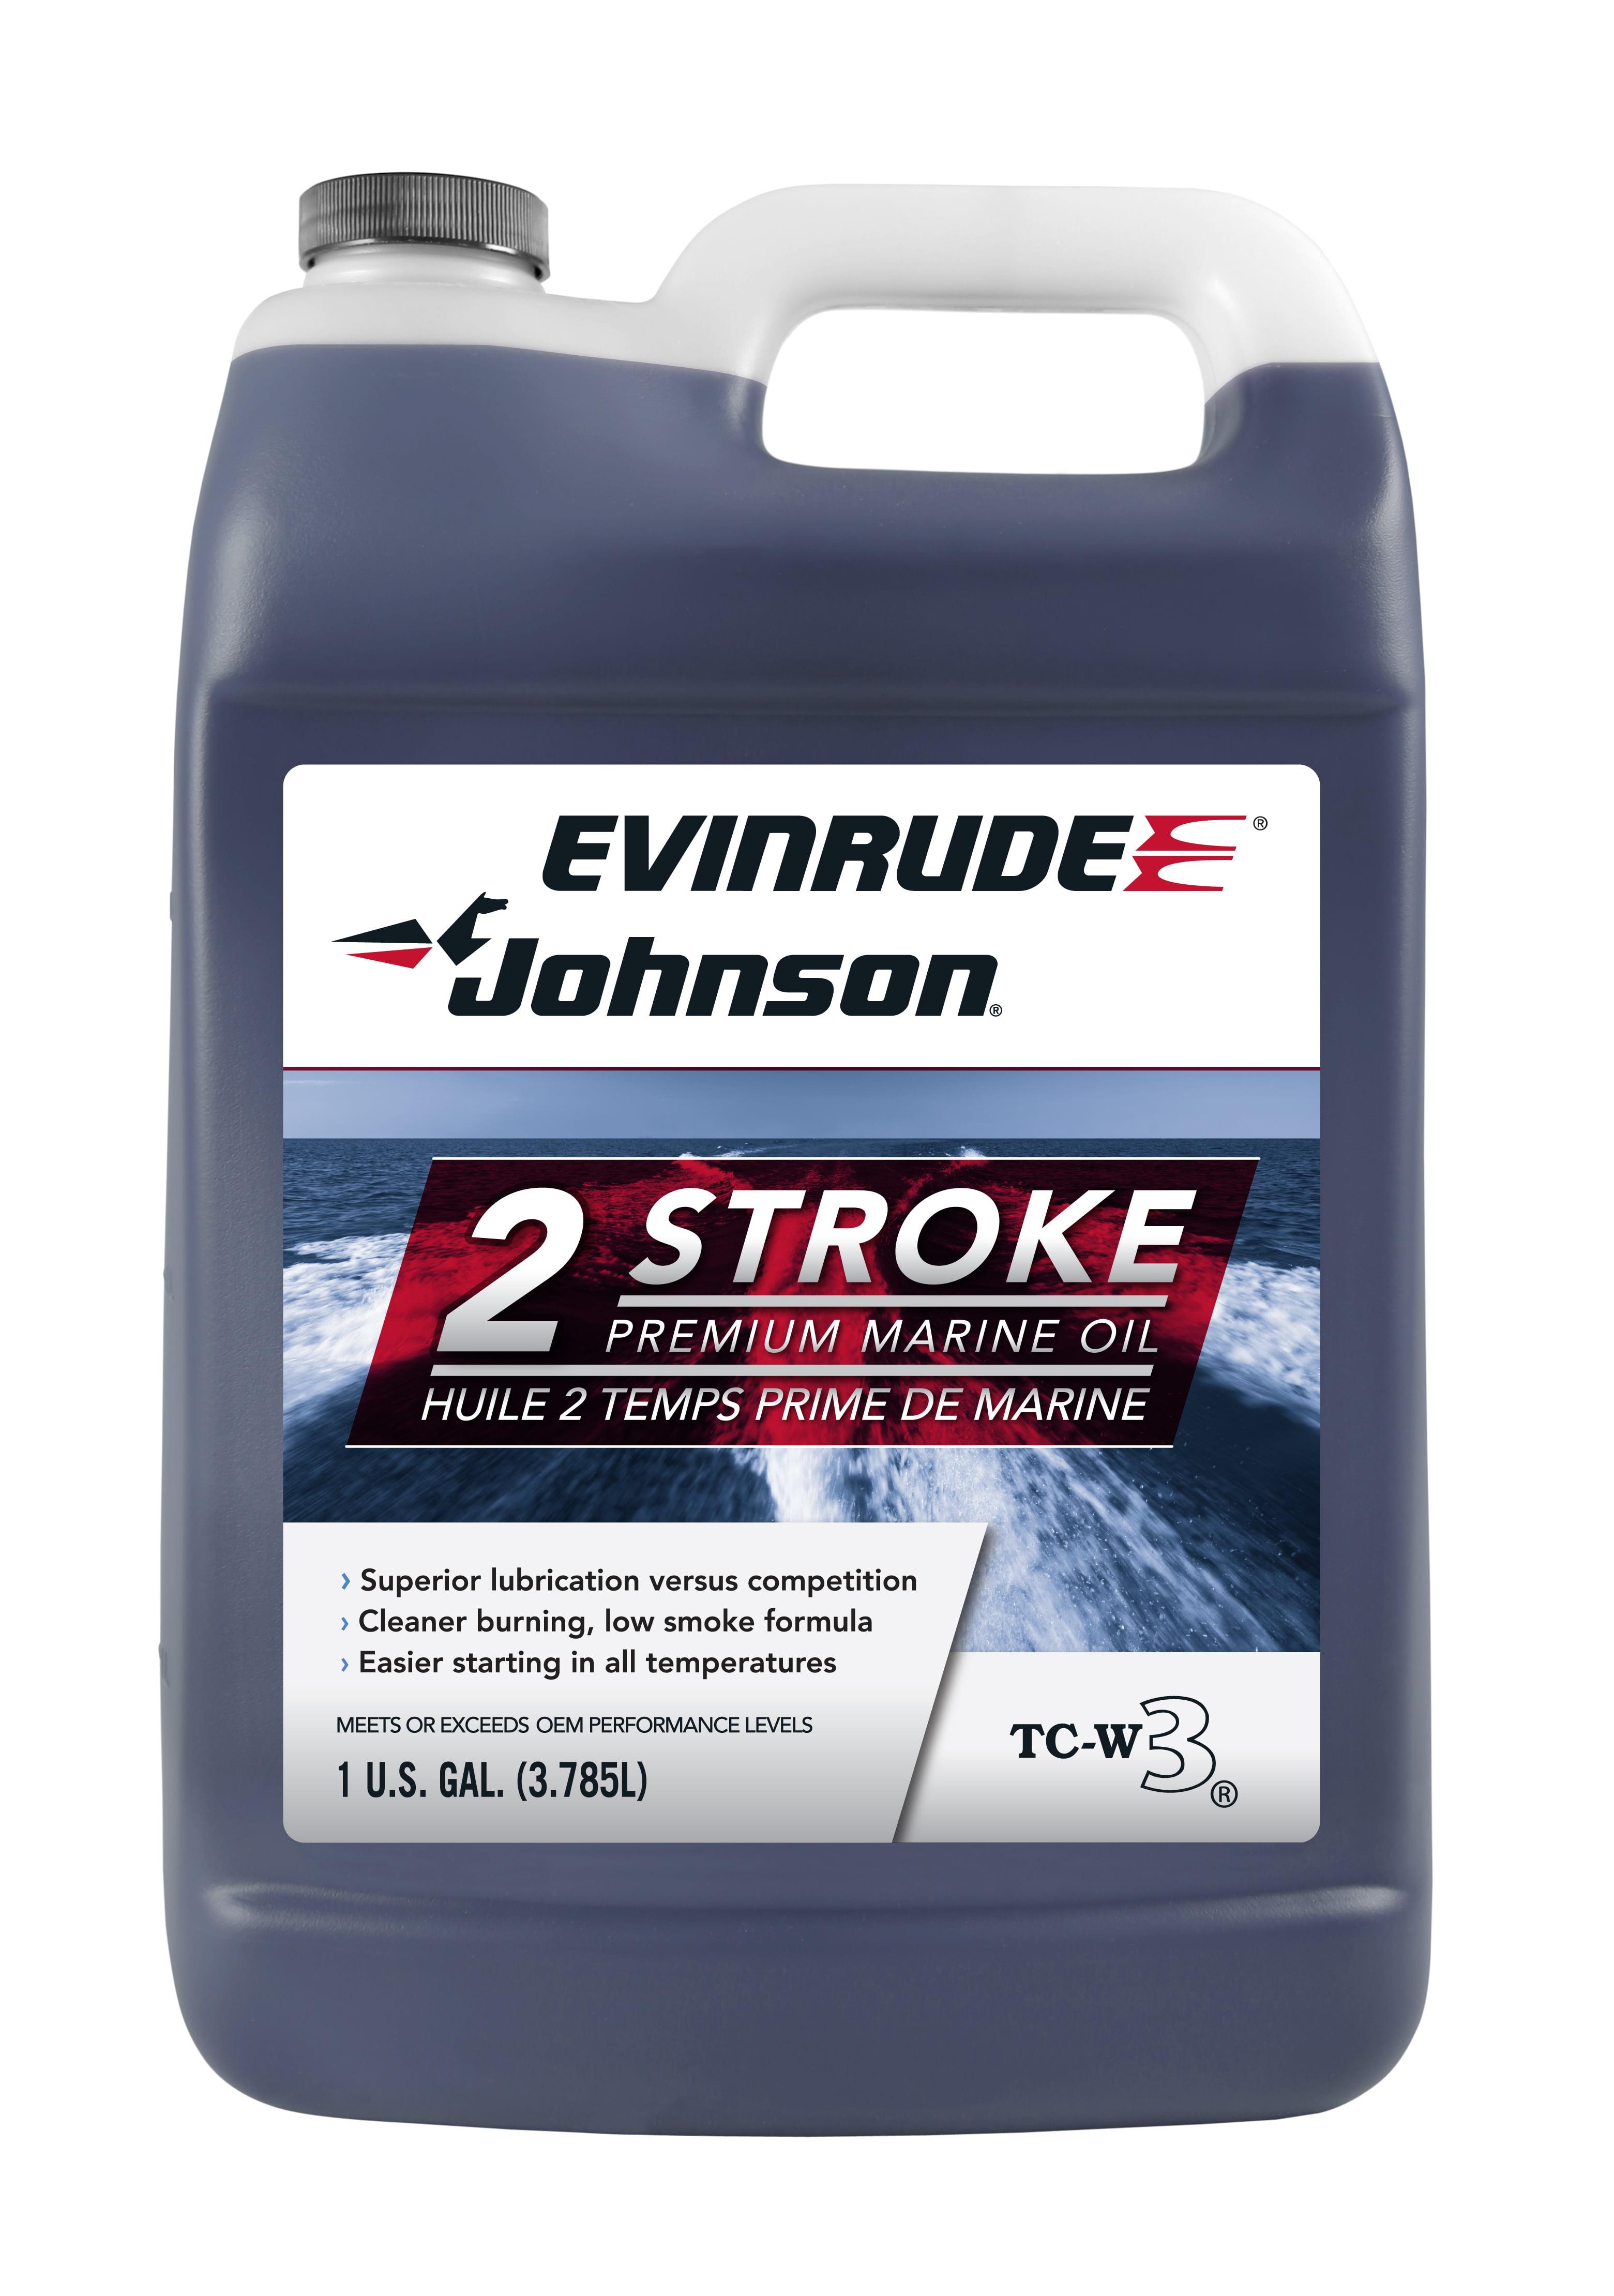 Evinrude/Johnson 2 Cycle Marine Oil - Walmart.com - Walmart.com